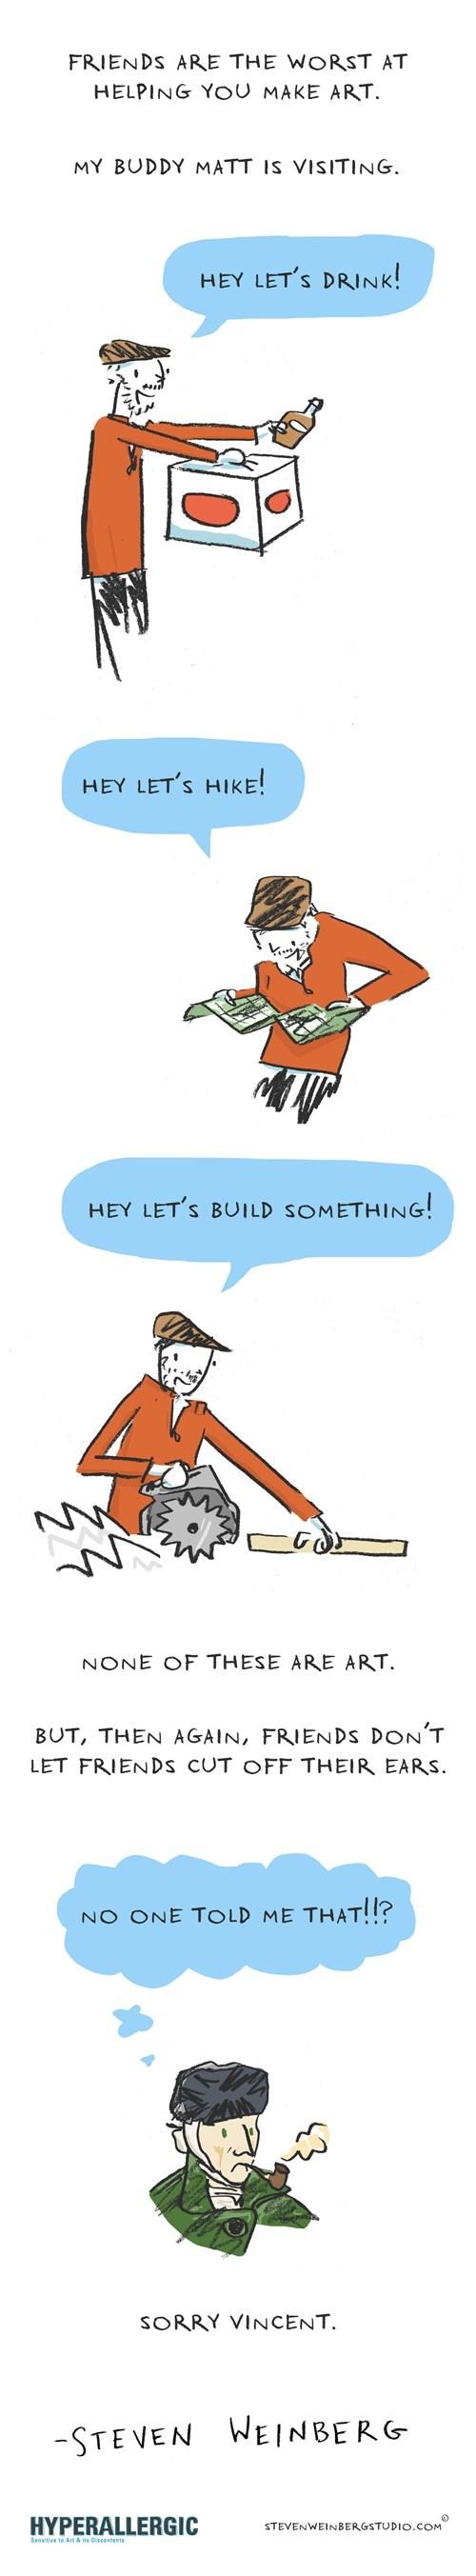 art friends sad but true web comics - 8372333056